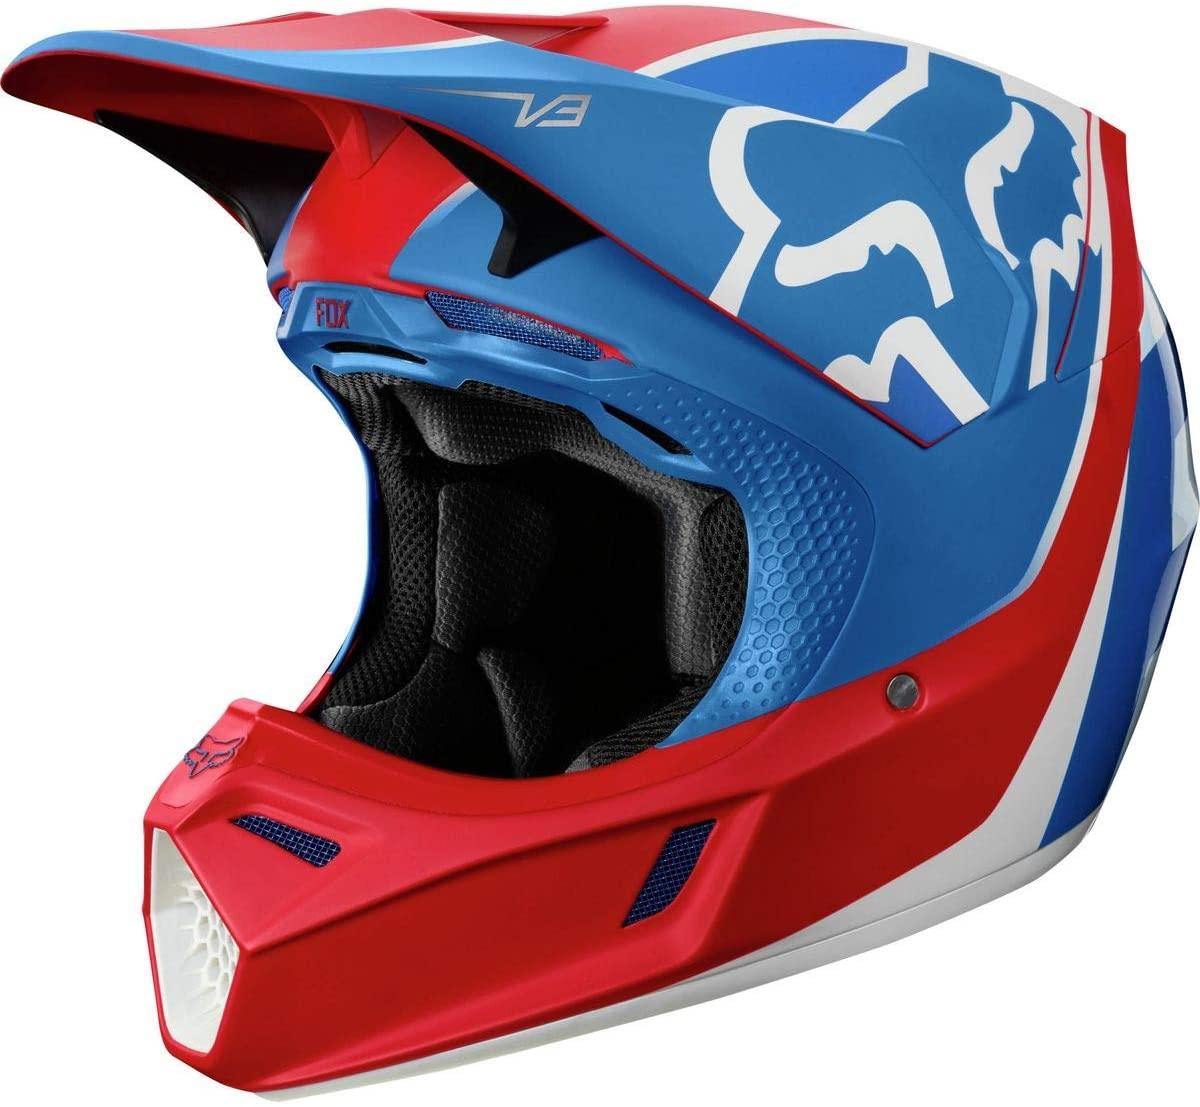 casco fox v3 kila blco/rojo/azul talle l